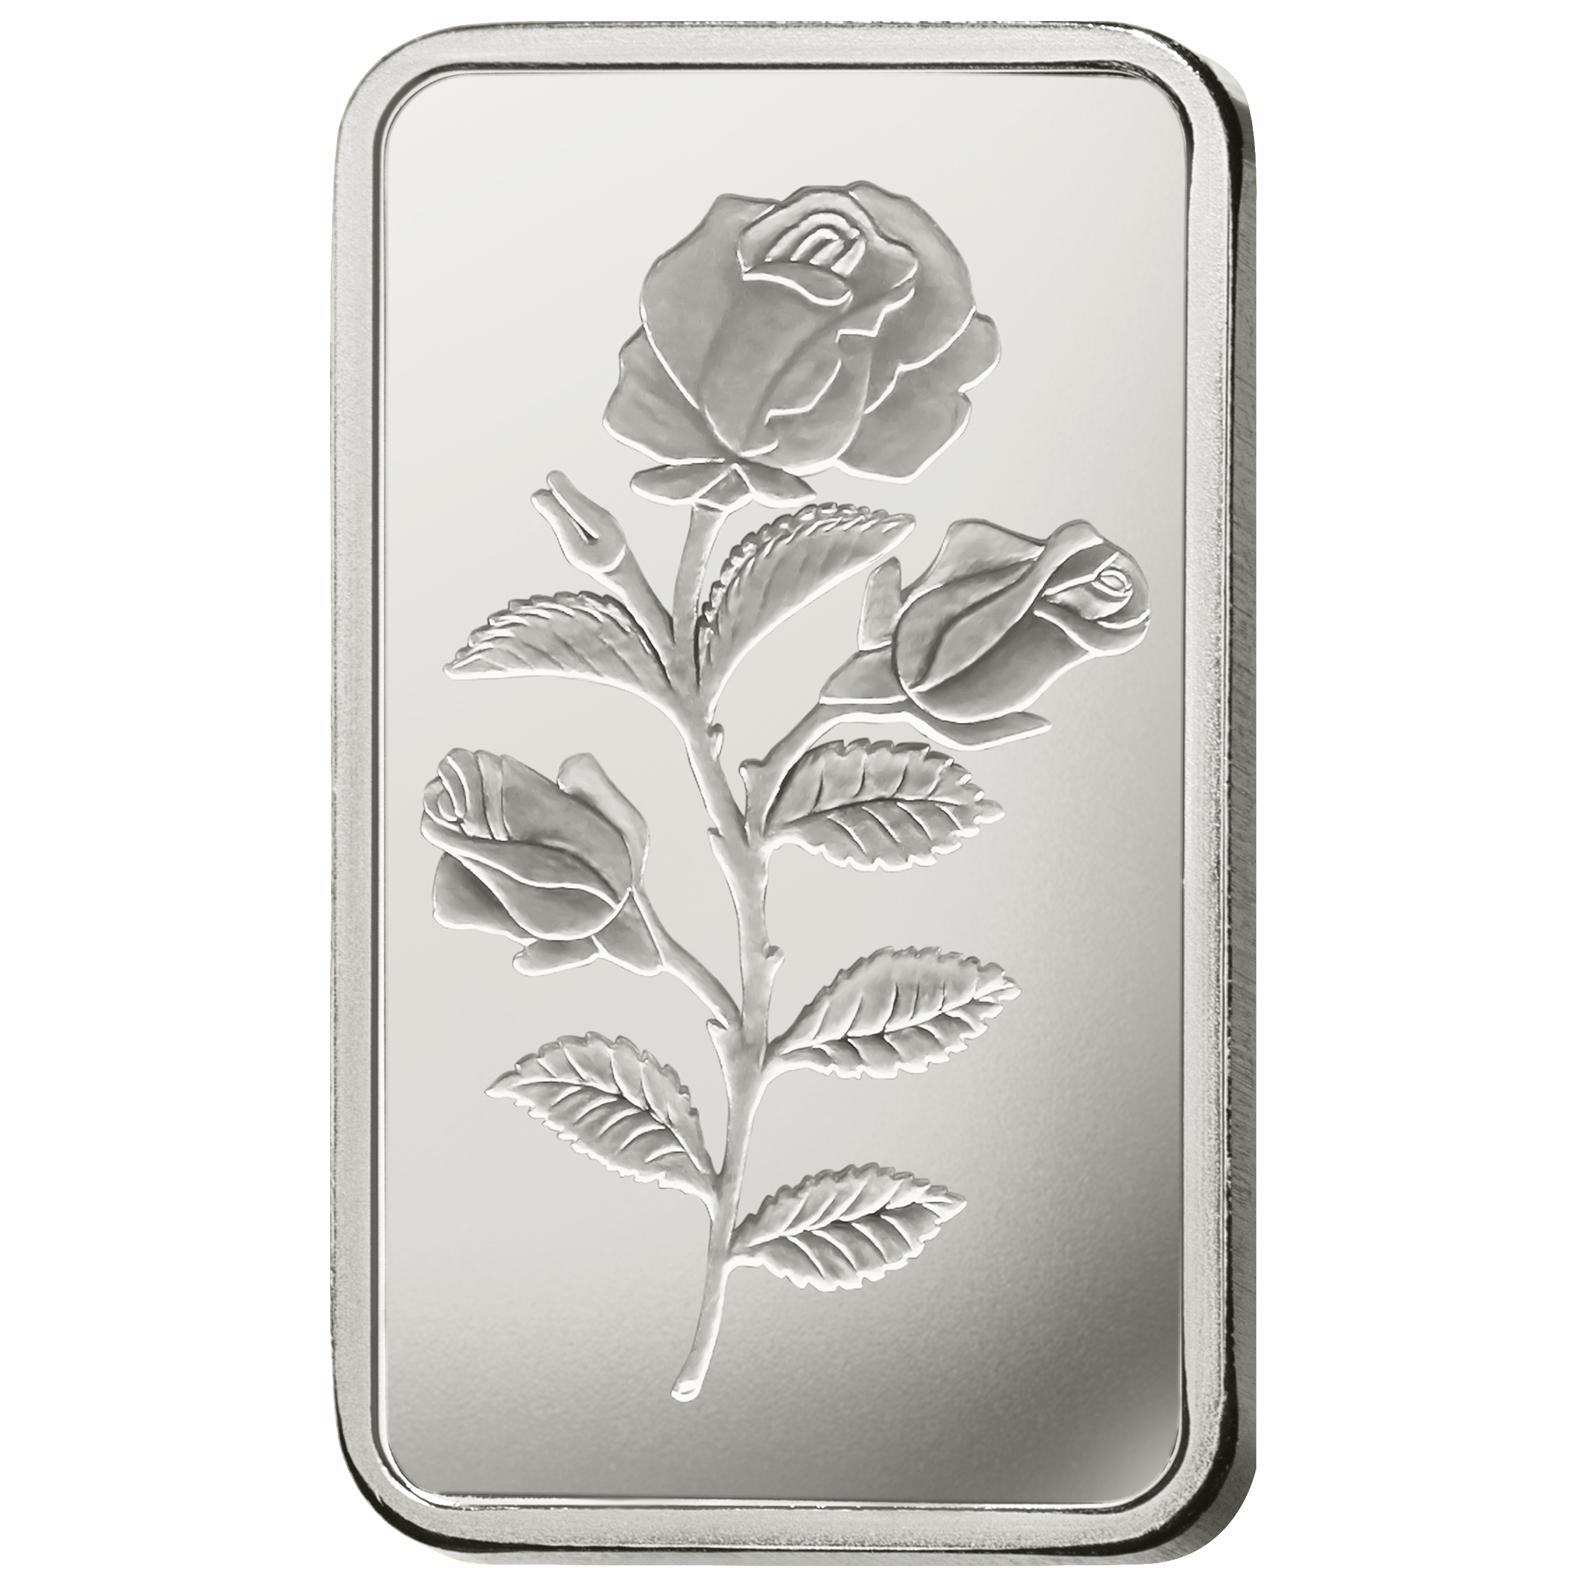 2.5 gram Silver Bar - PAMP Suisse Rosa